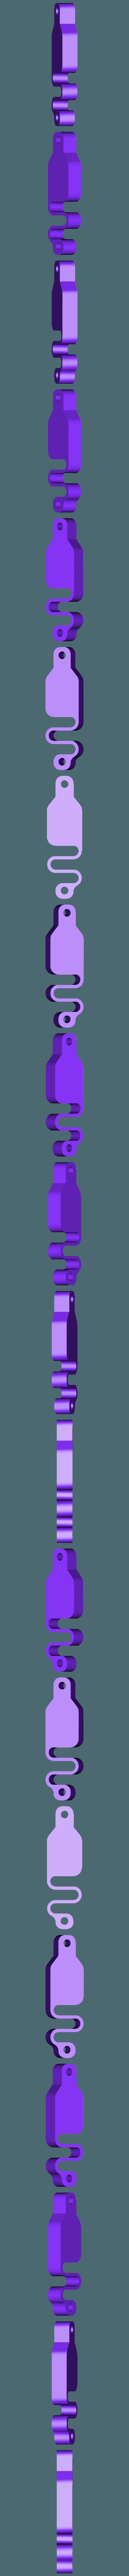 TruckV3_Spring_Ninjaflex.STL Download STL file 3D Printed RC Truck V3 • 3D print model, MrCrankyface